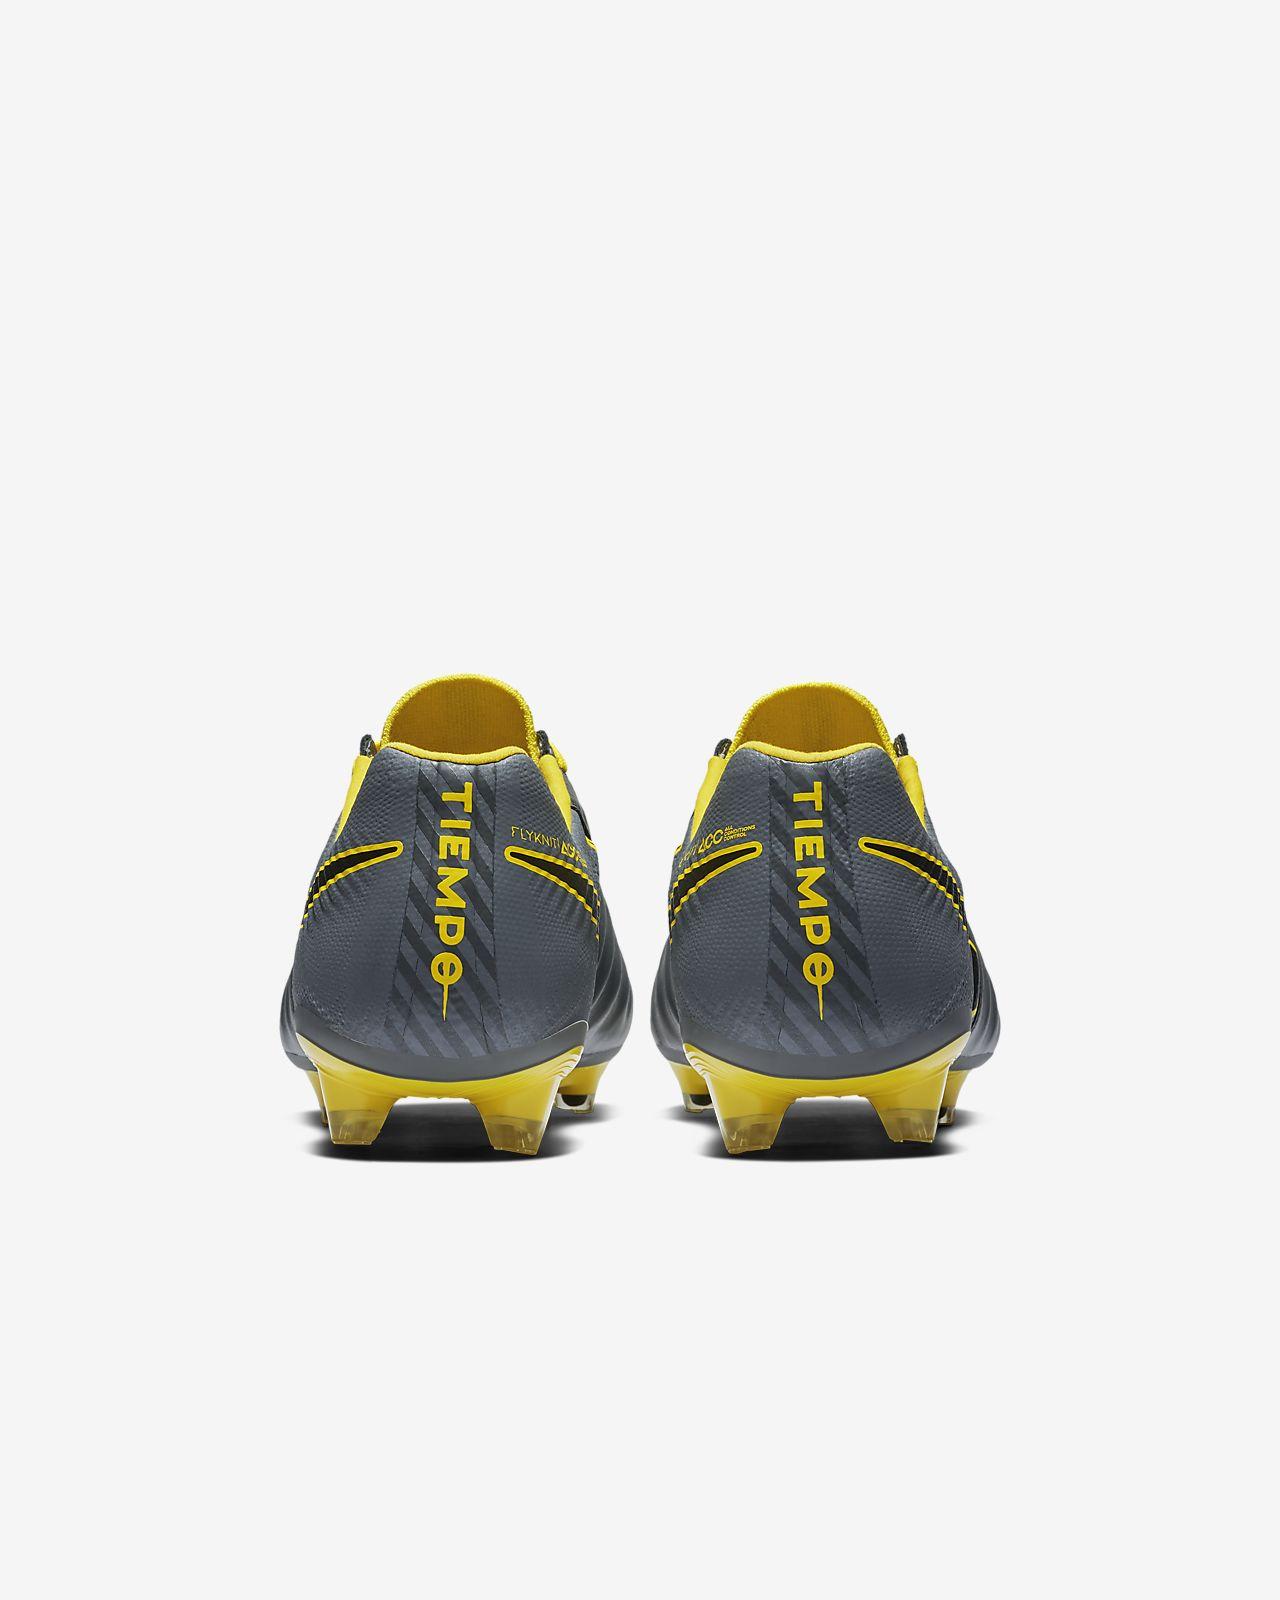 491f6b0b76bc5 Nike Legend 7 Elite FG Game Over Firm-Ground Football Boot. Nike.com GB